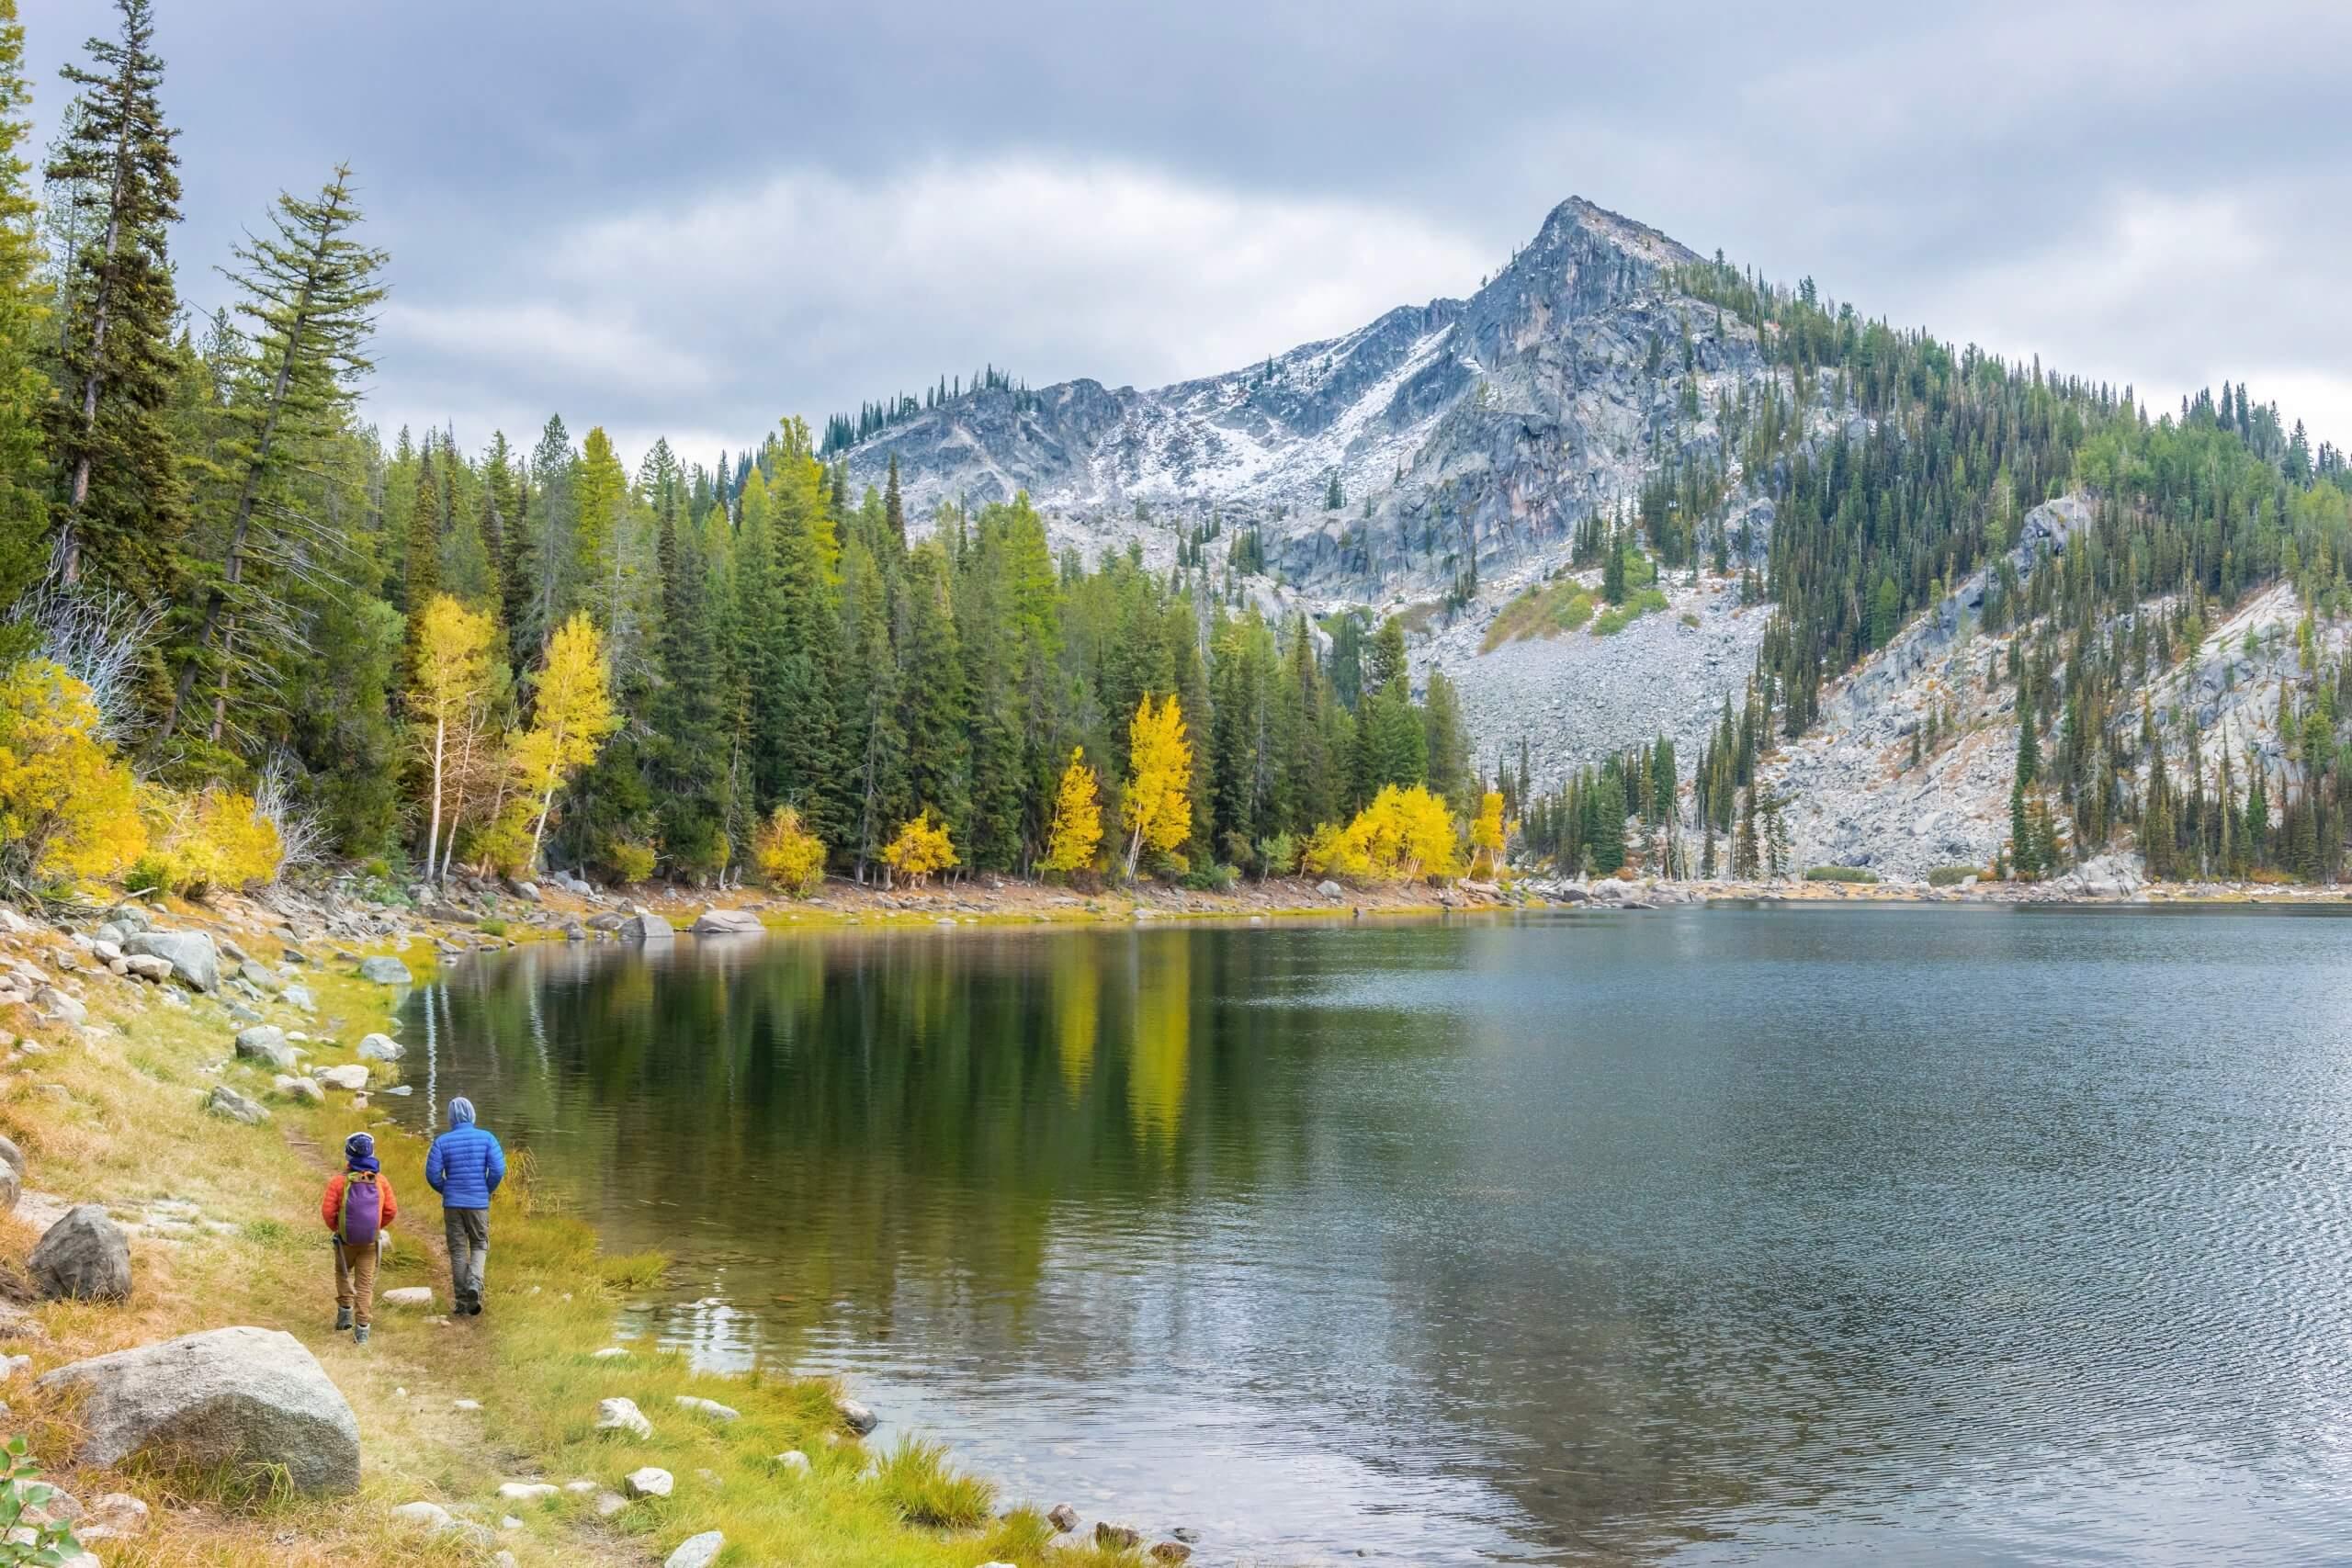 hiking by a lake